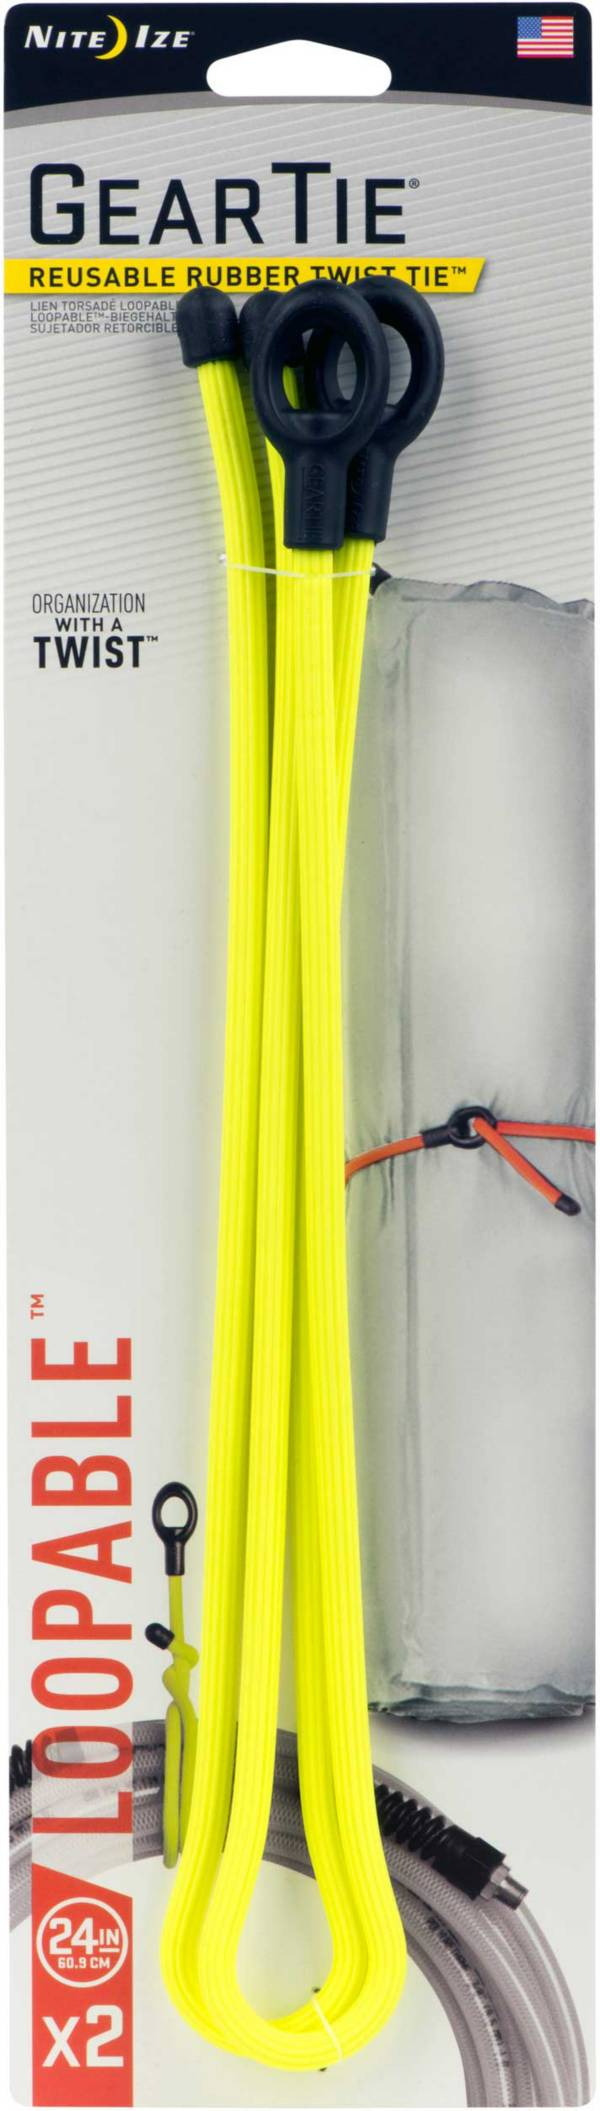 "Nite Ize Gear Tie 24"" Loopable Twist Tie – 2 Pack product image"